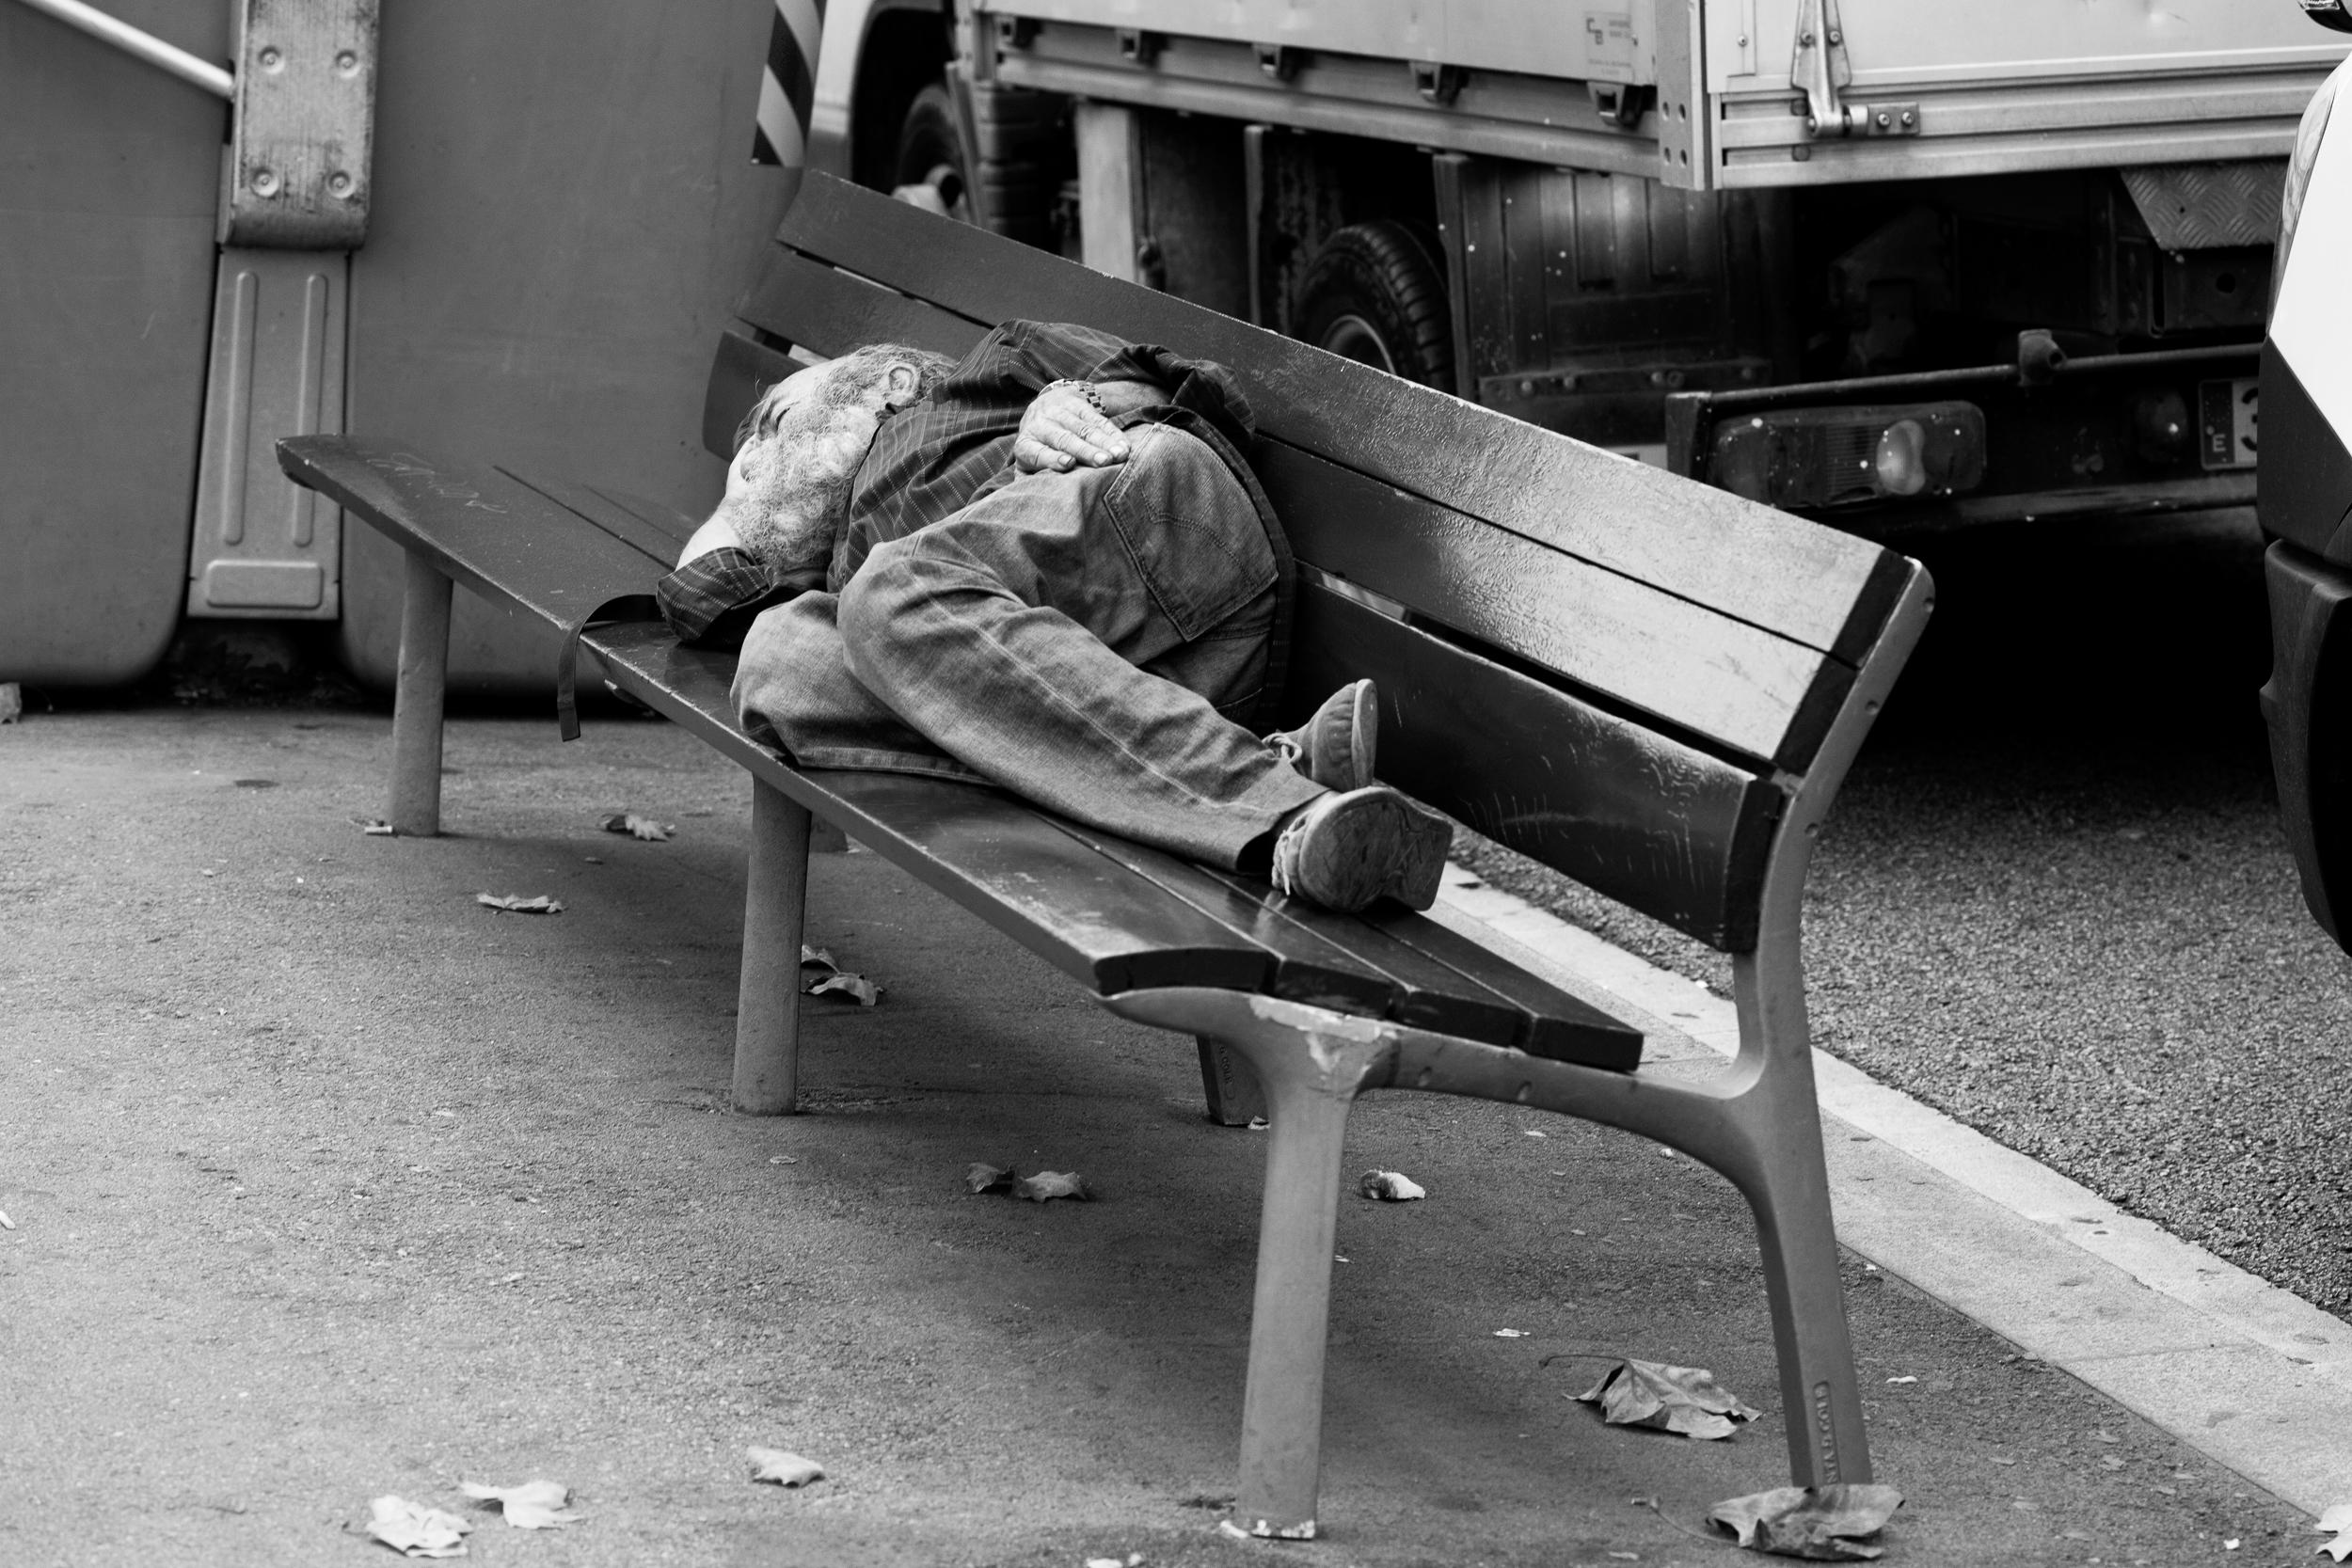 Chacon Images_Barcelona_Street_WEB_-0052.jpg